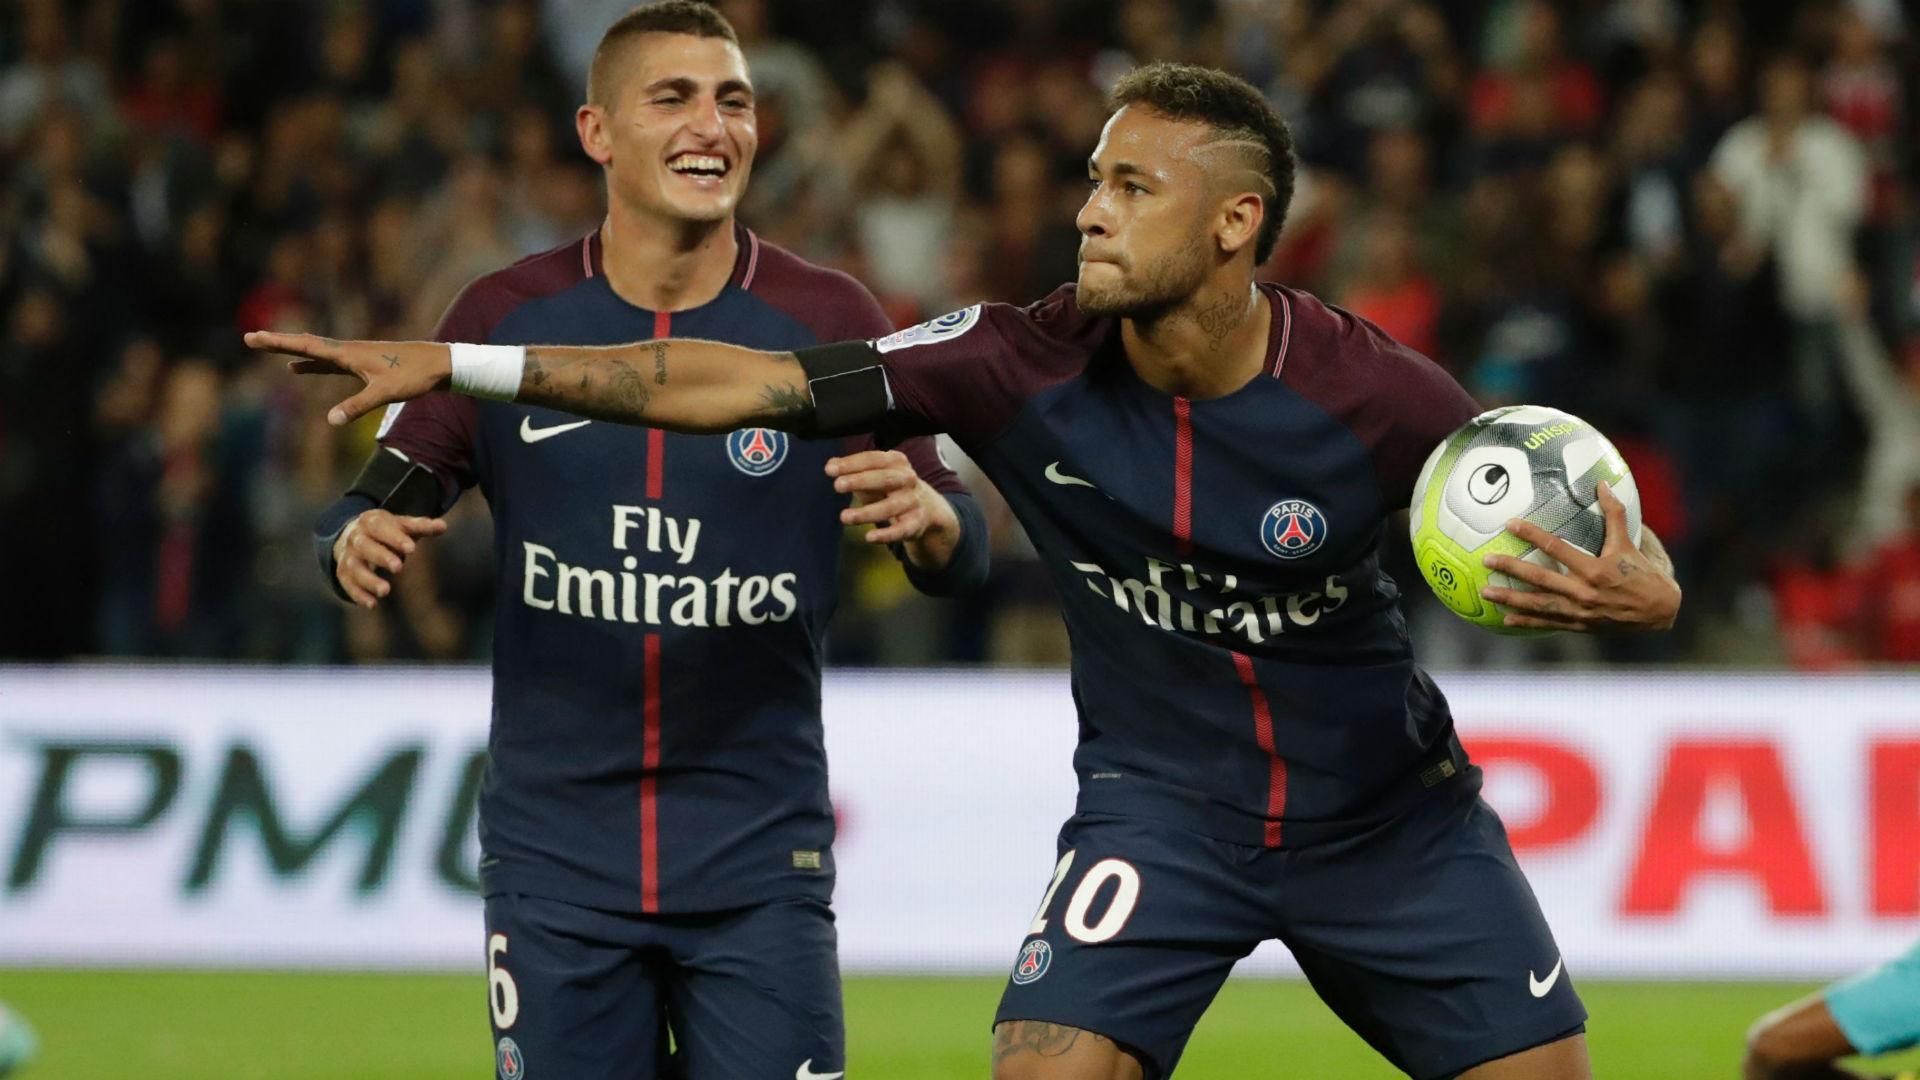 Ligue 1: doppietta di Neymar, il Psg travolge il Tolosa 6-2